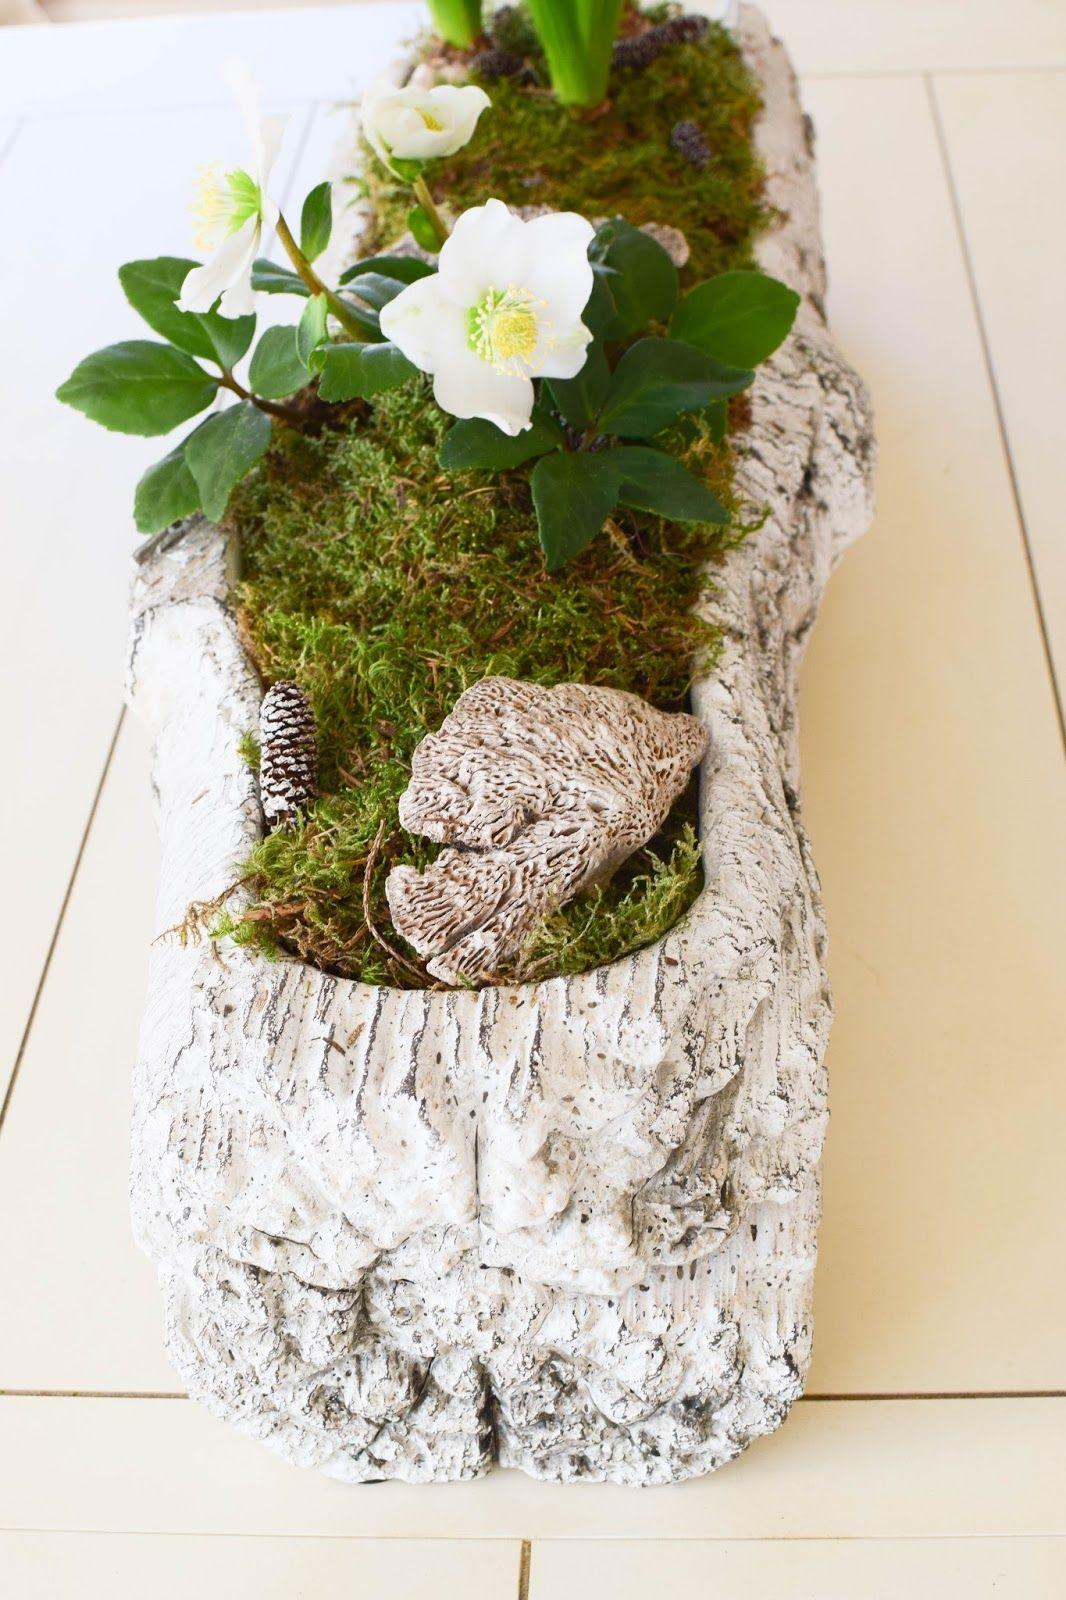 schale dekorieren fruhling finest tablett dekorieren im frhling hbsche with schale dekorieren. Black Bedroom Furniture Sets. Home Design Ideas